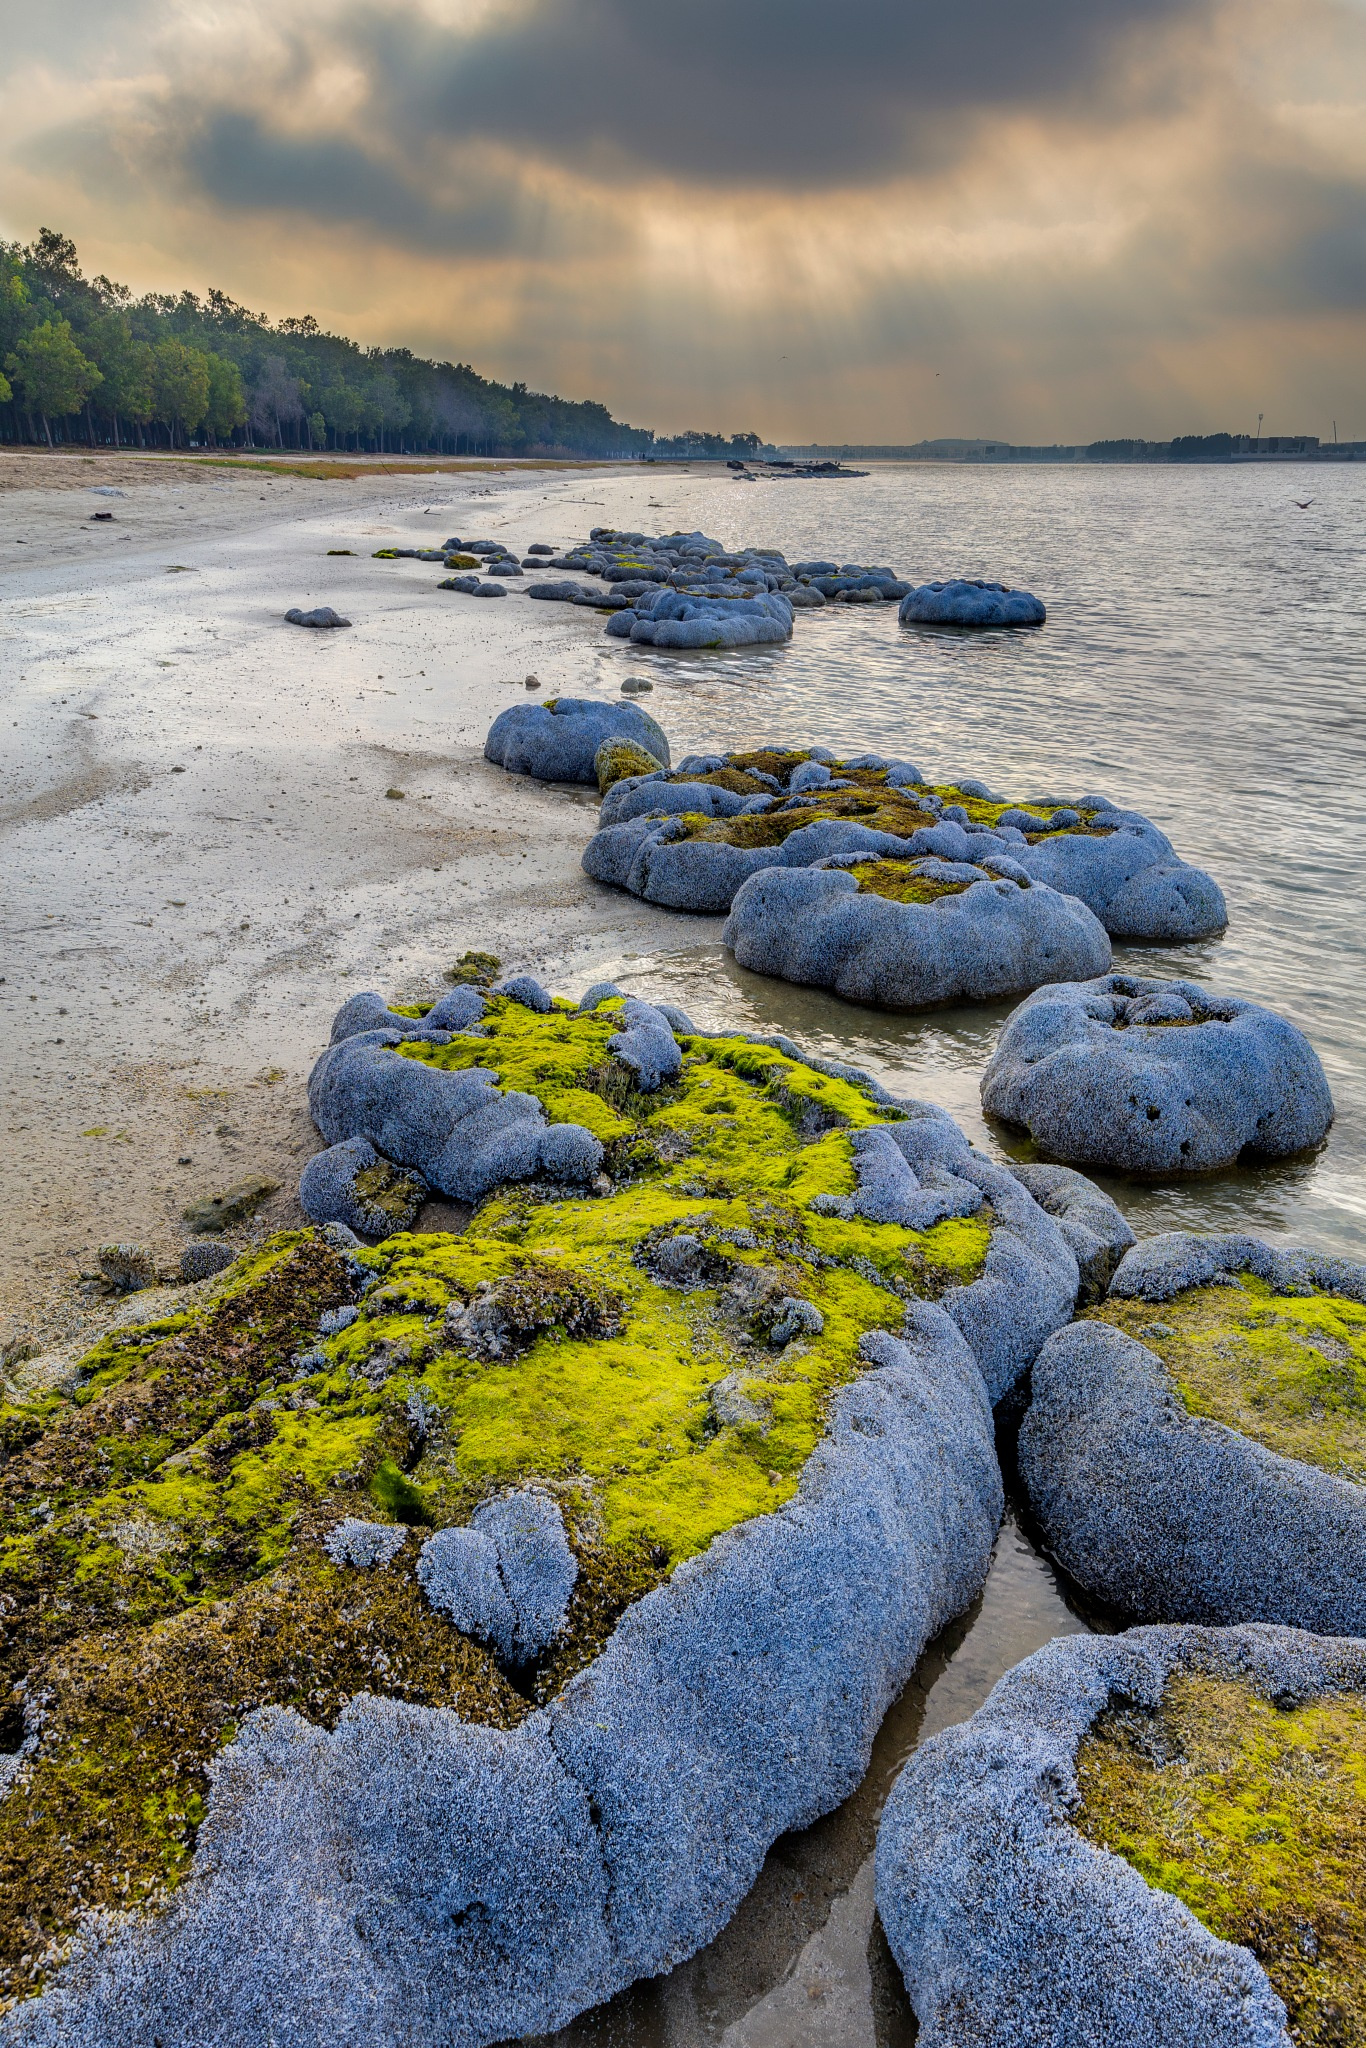 The Green Beach by Murshed AlMehairi